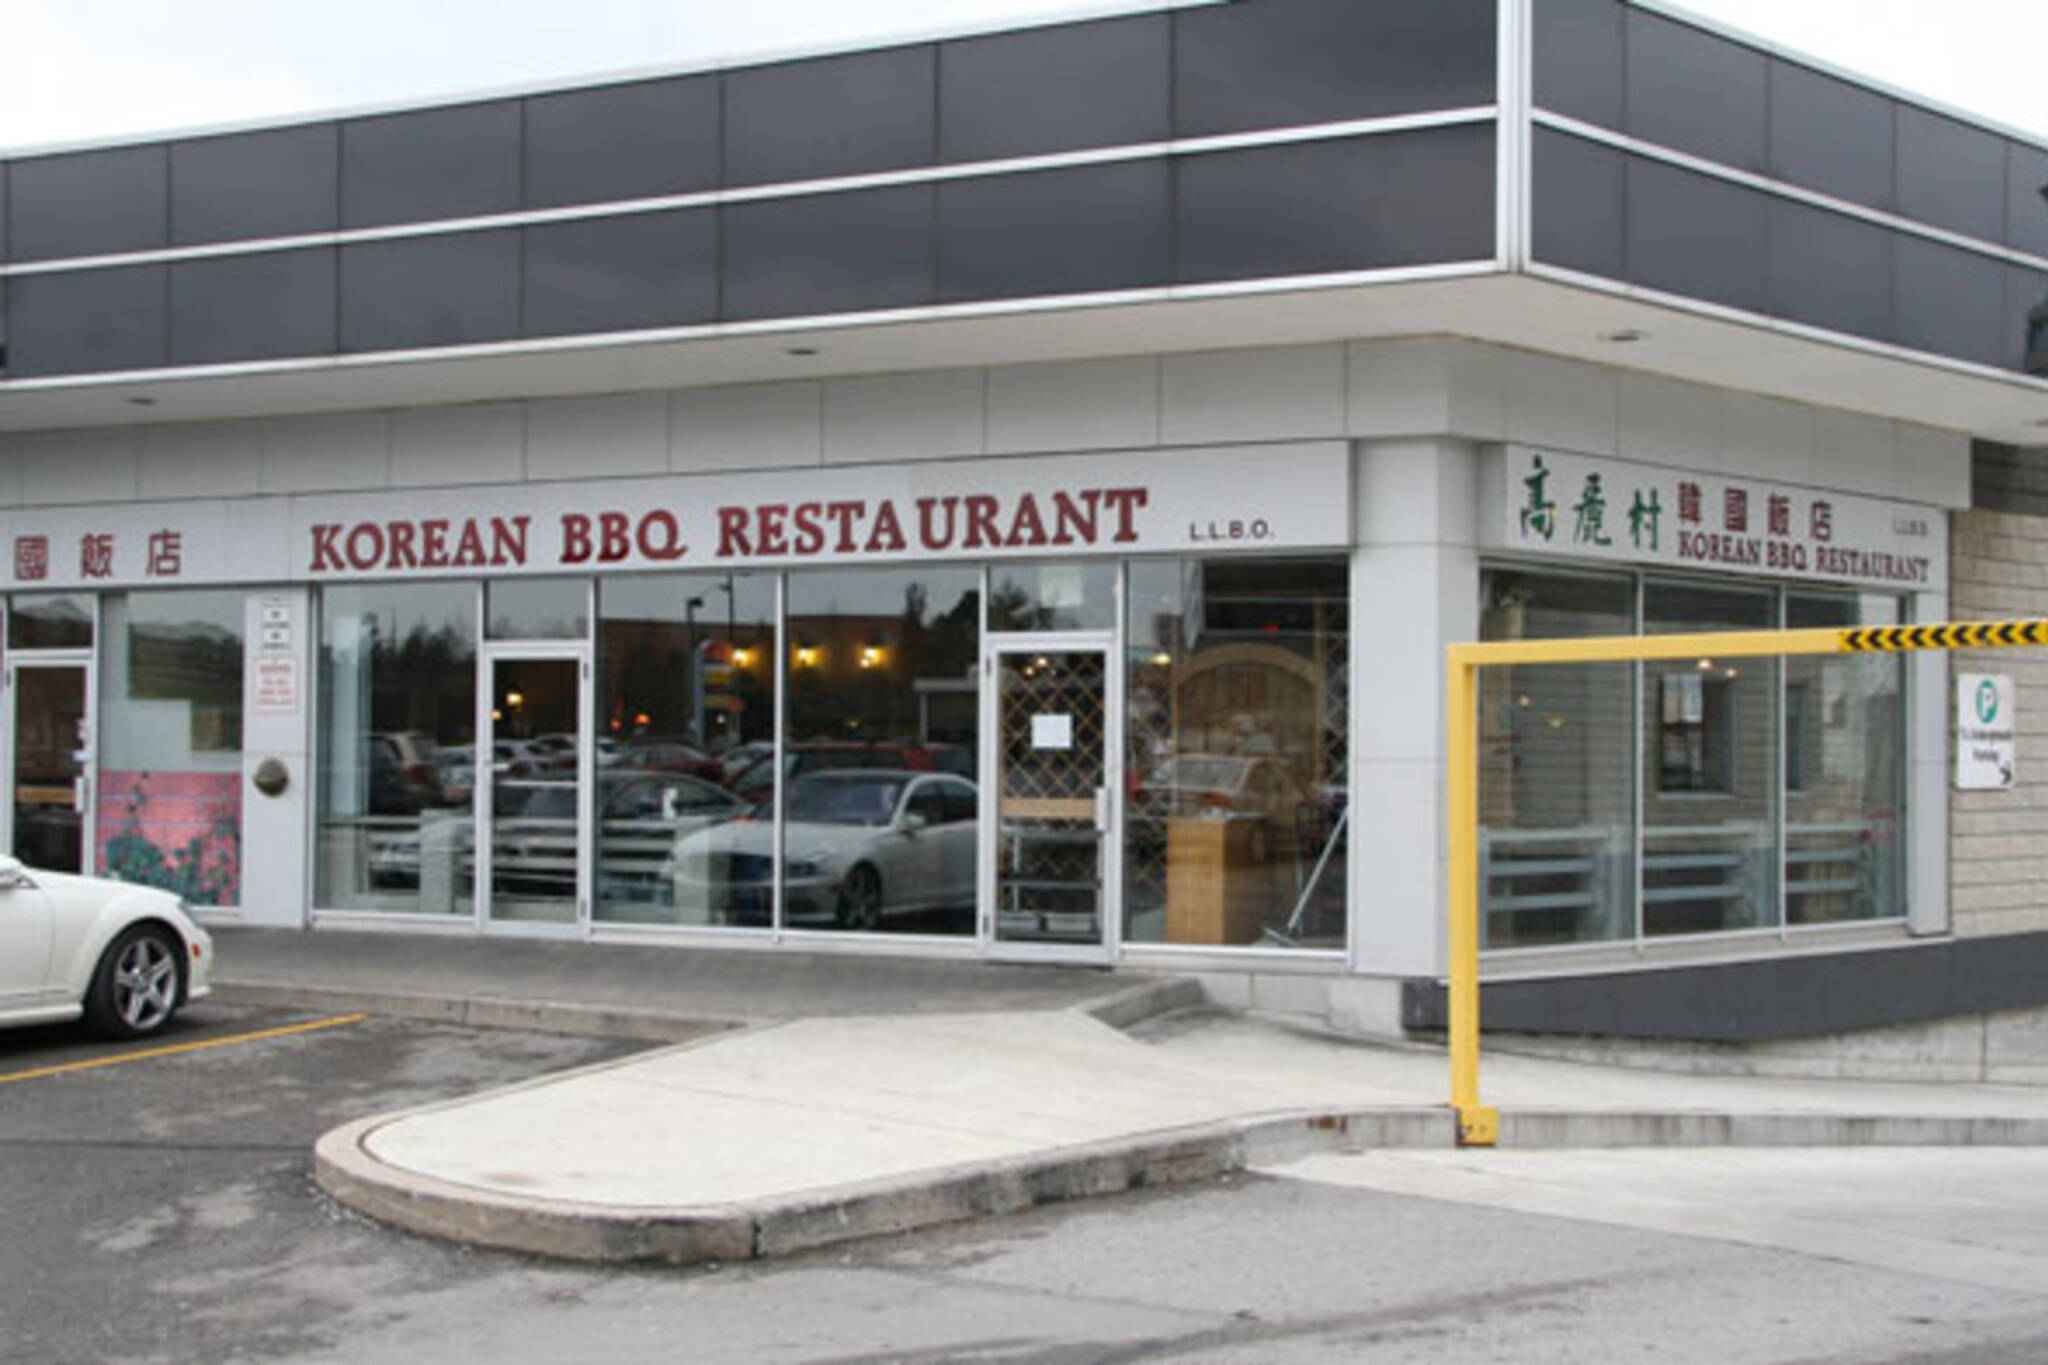 Korean BBQ Restaurant (Richmond Hill)